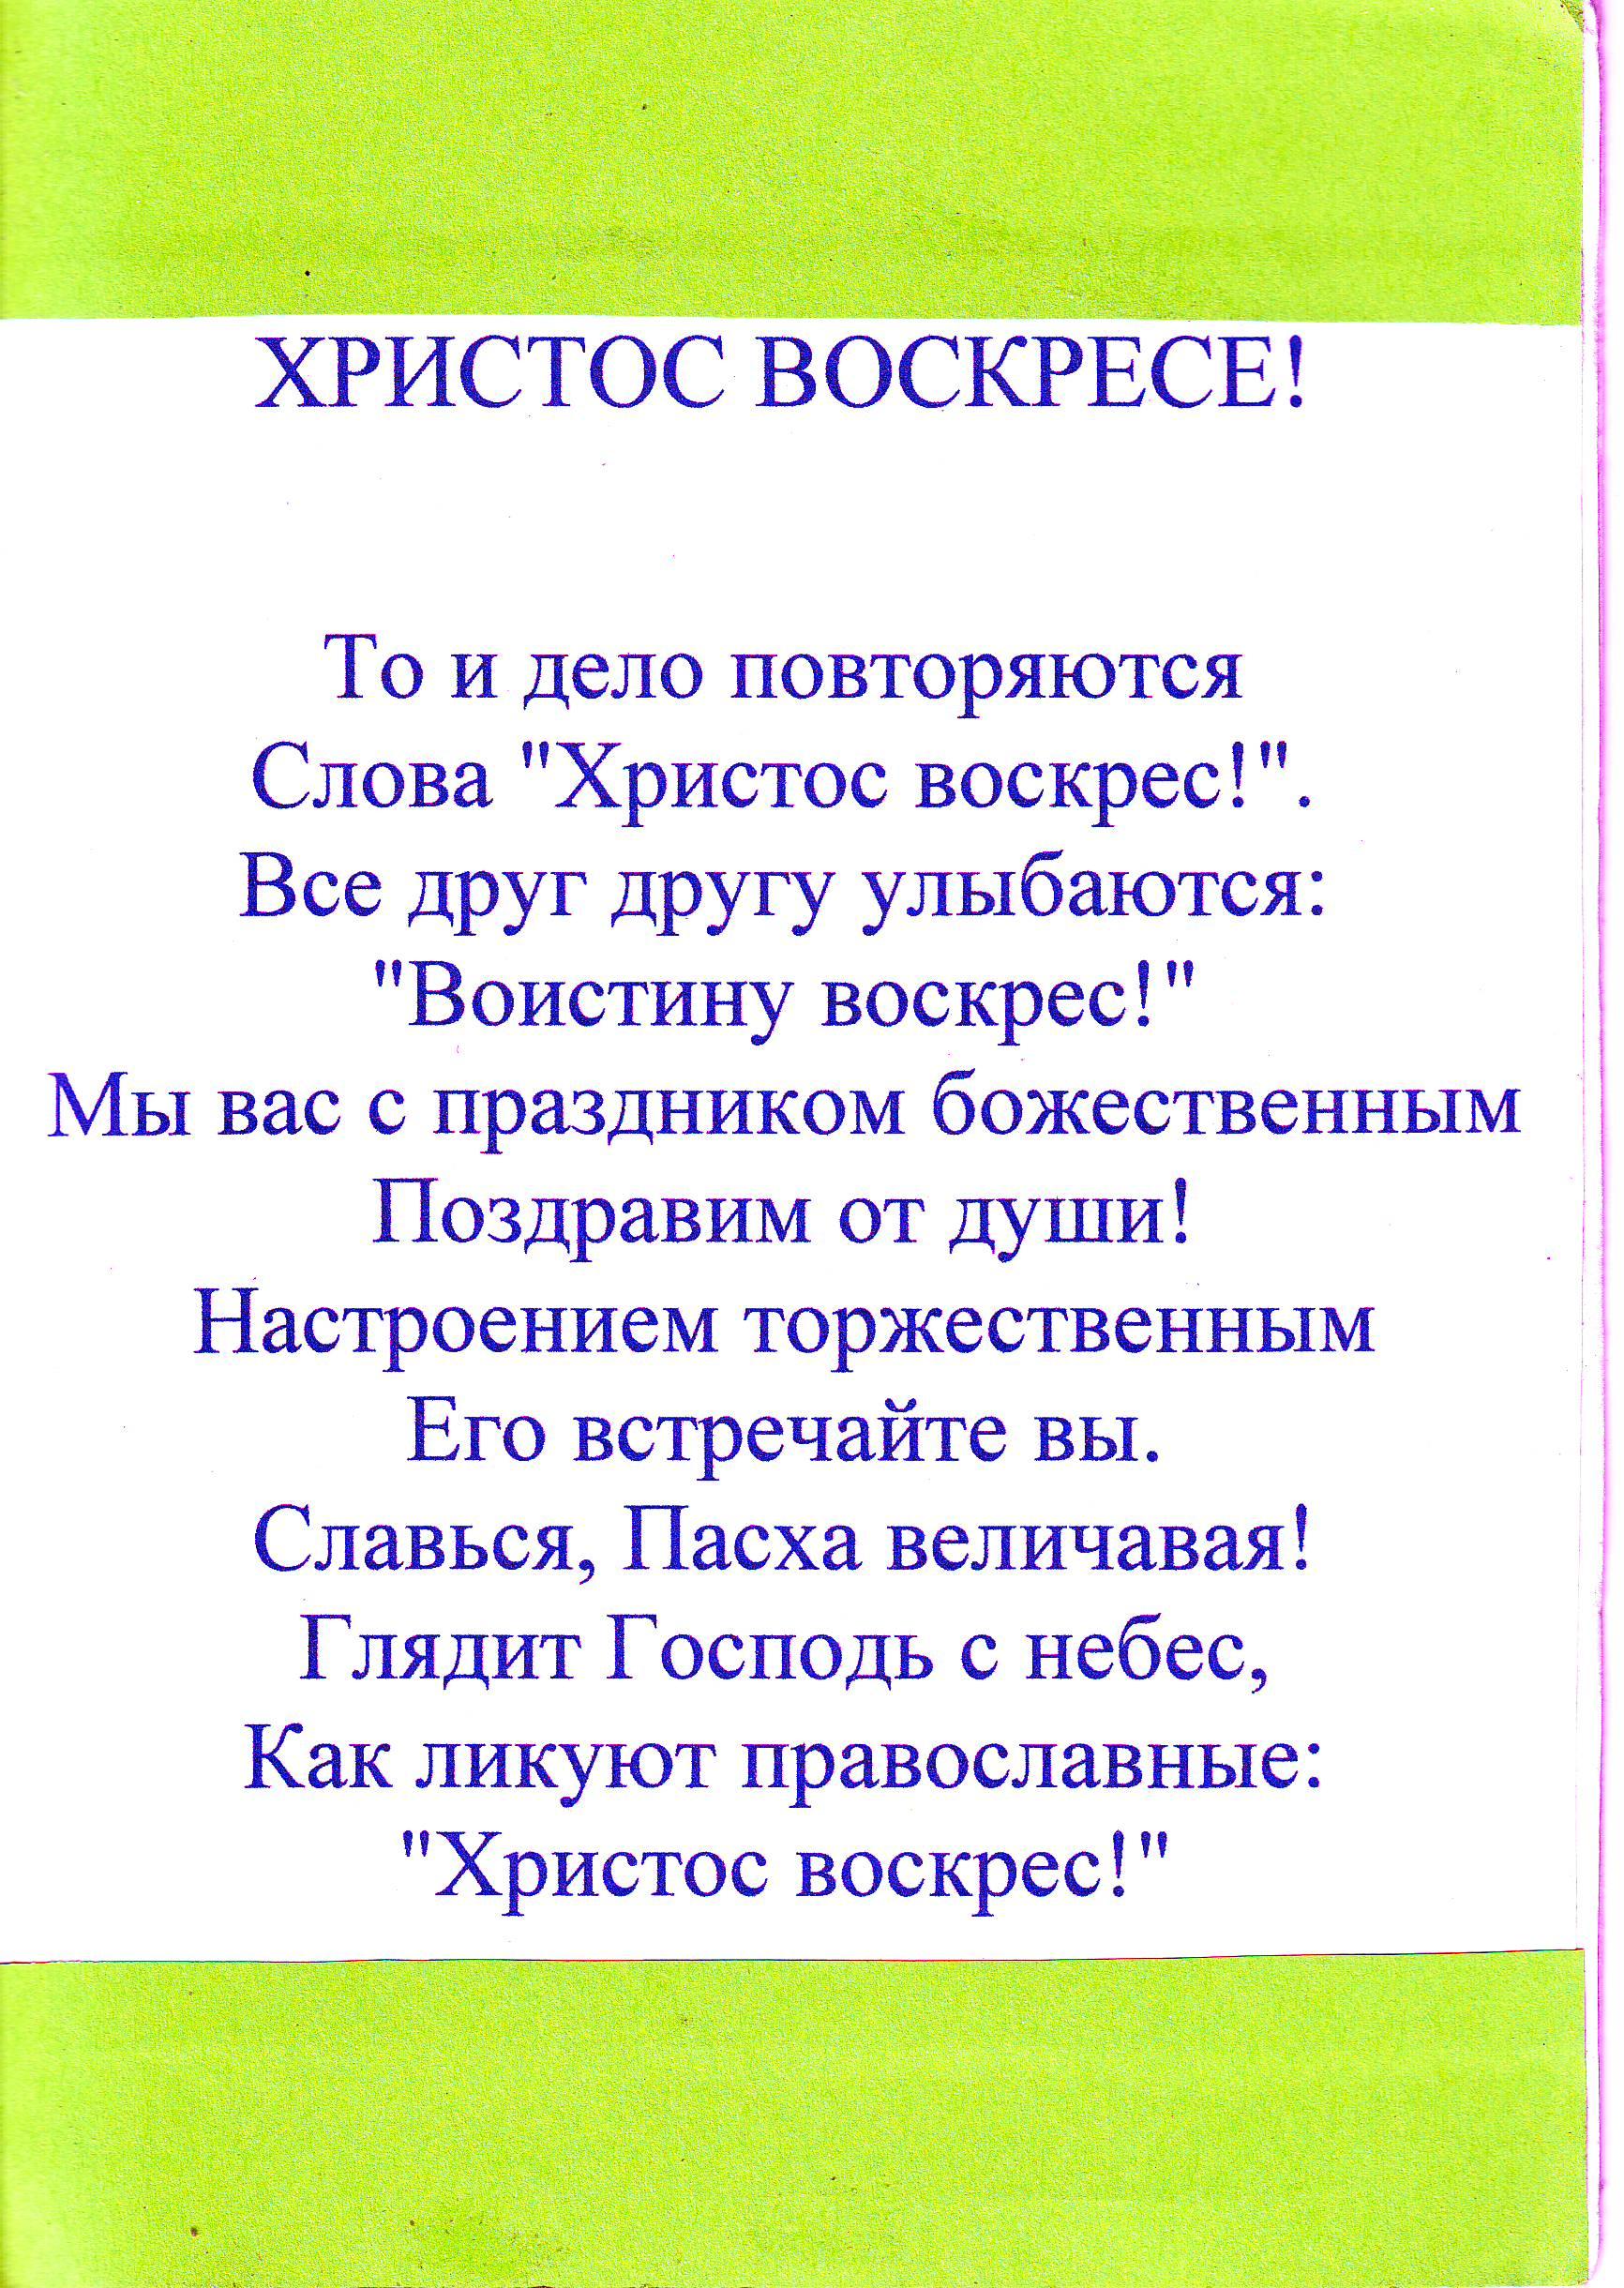 hello_html_md0f3cb2.jpg